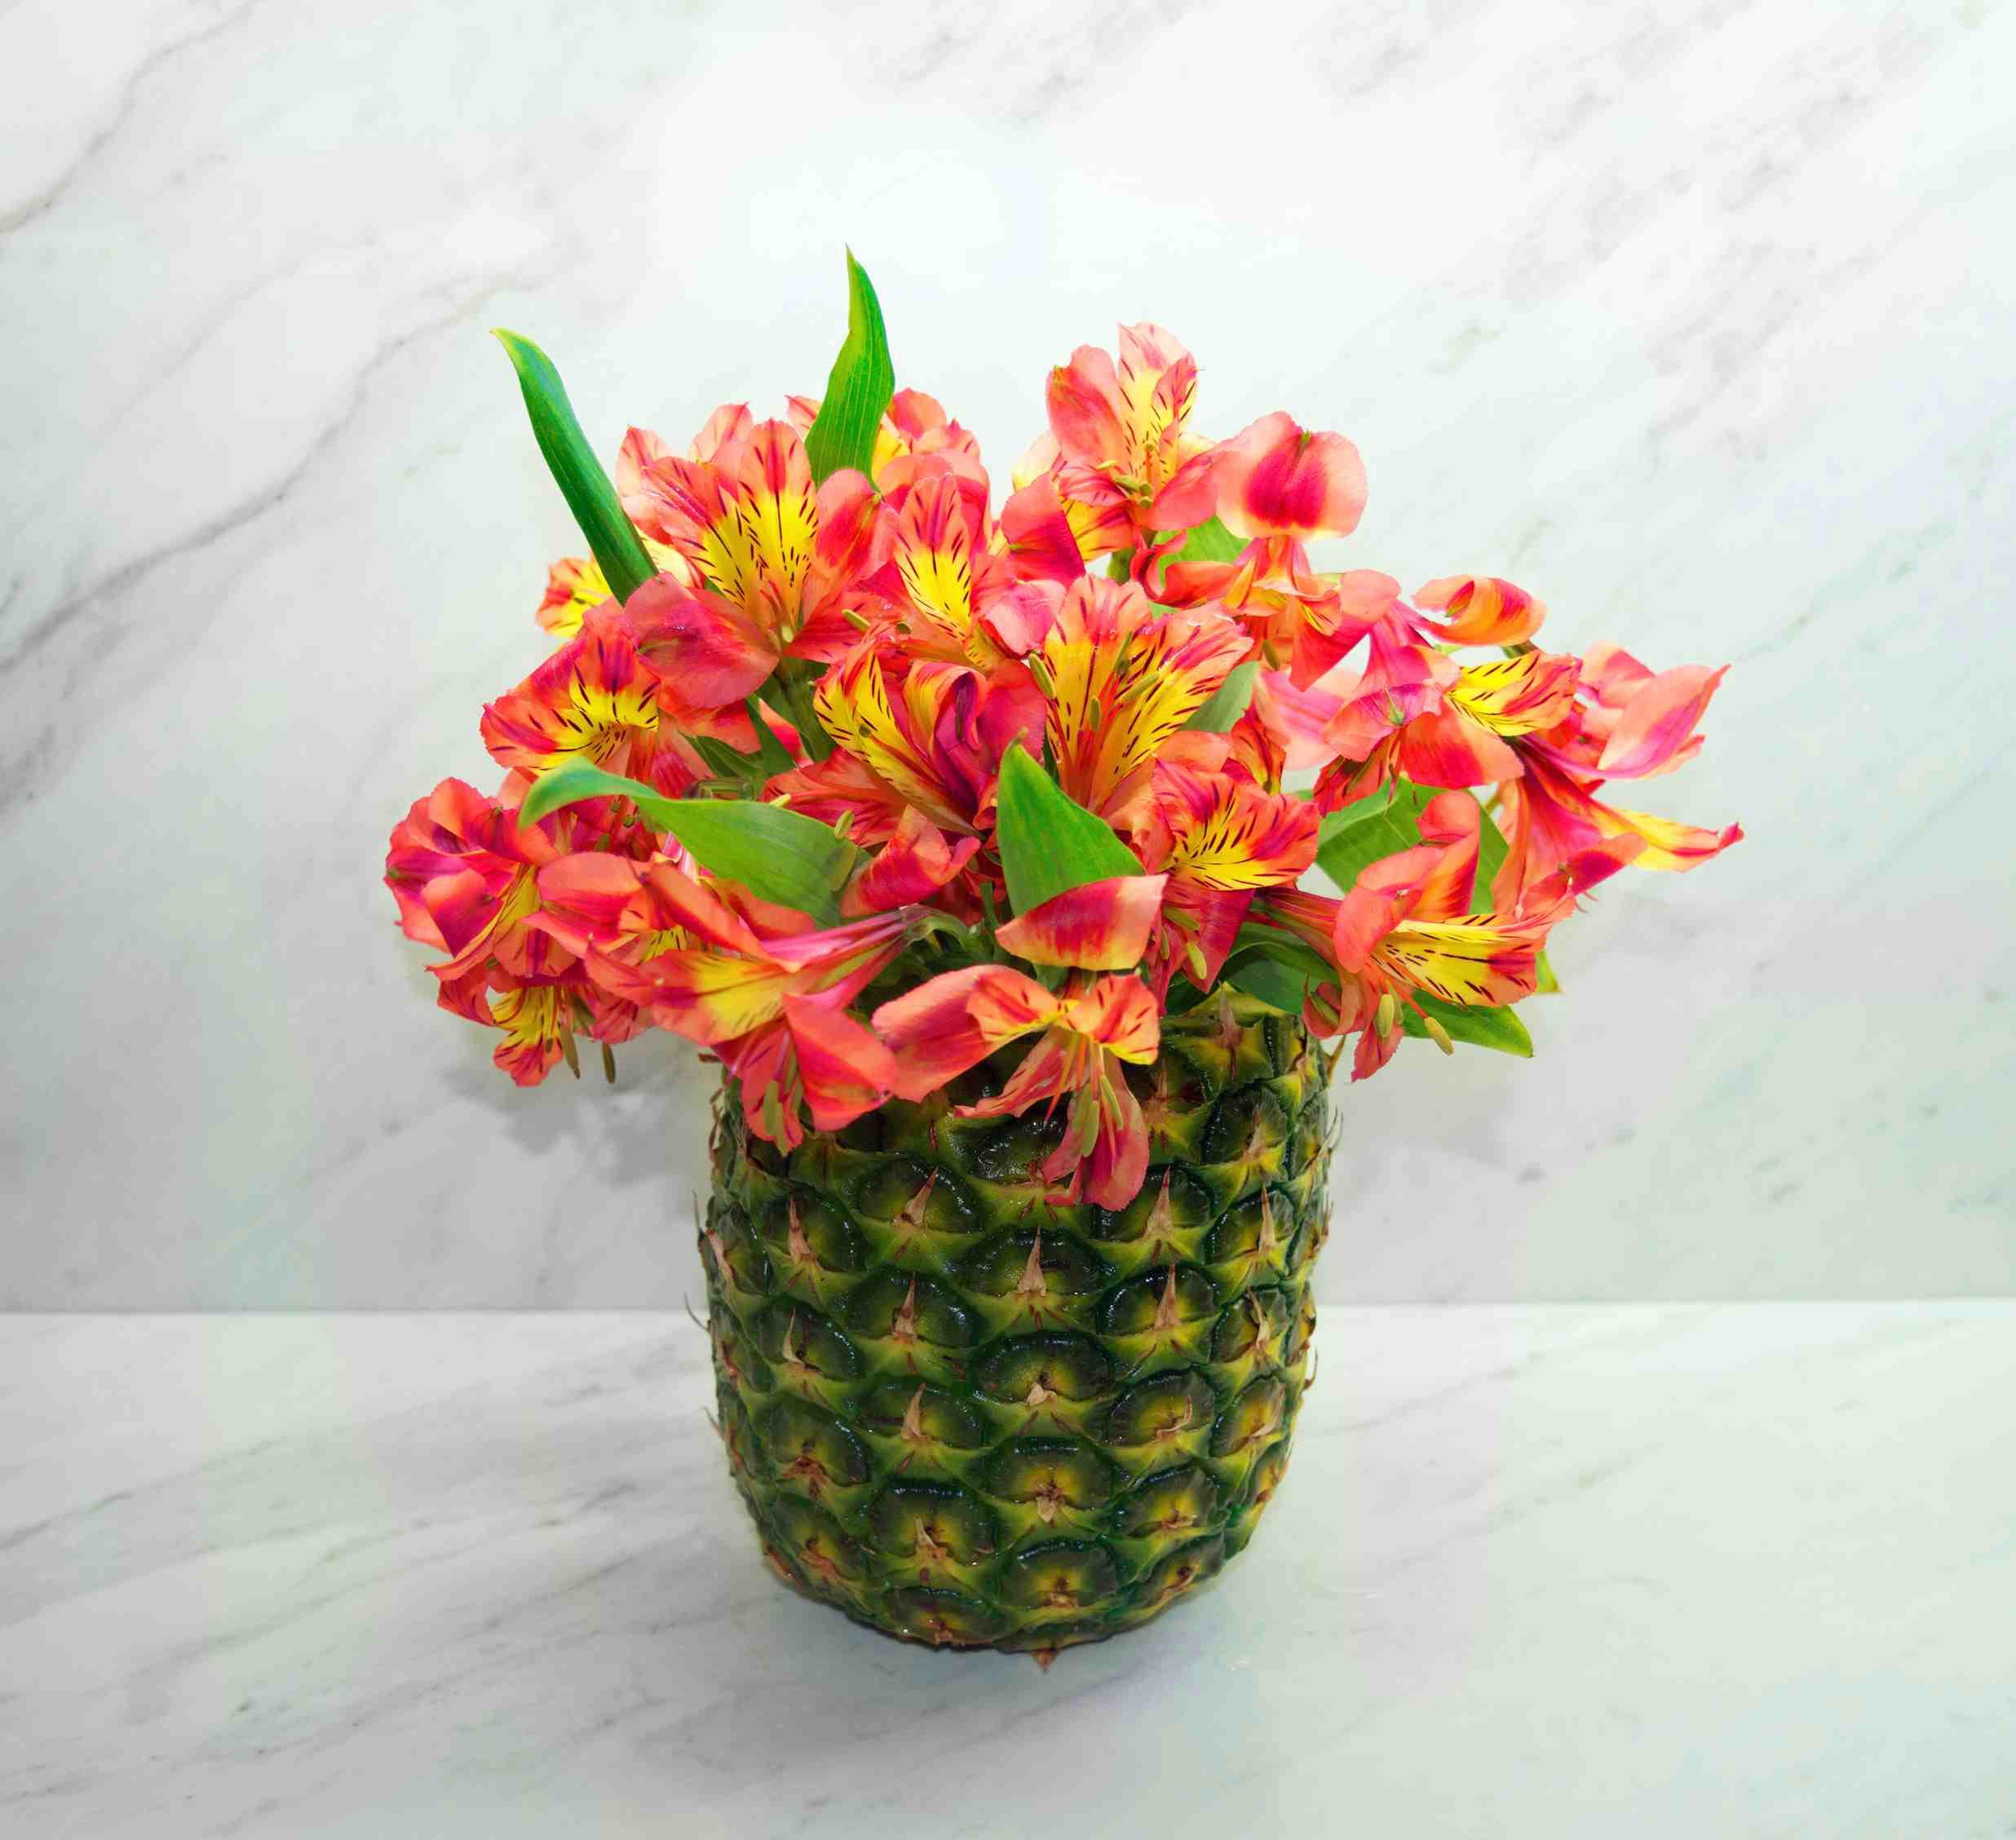 ikebana flower vase of diy pineapple vase floral arrangement within diy pineapple vase 56a262c53df78cf77274f3c3